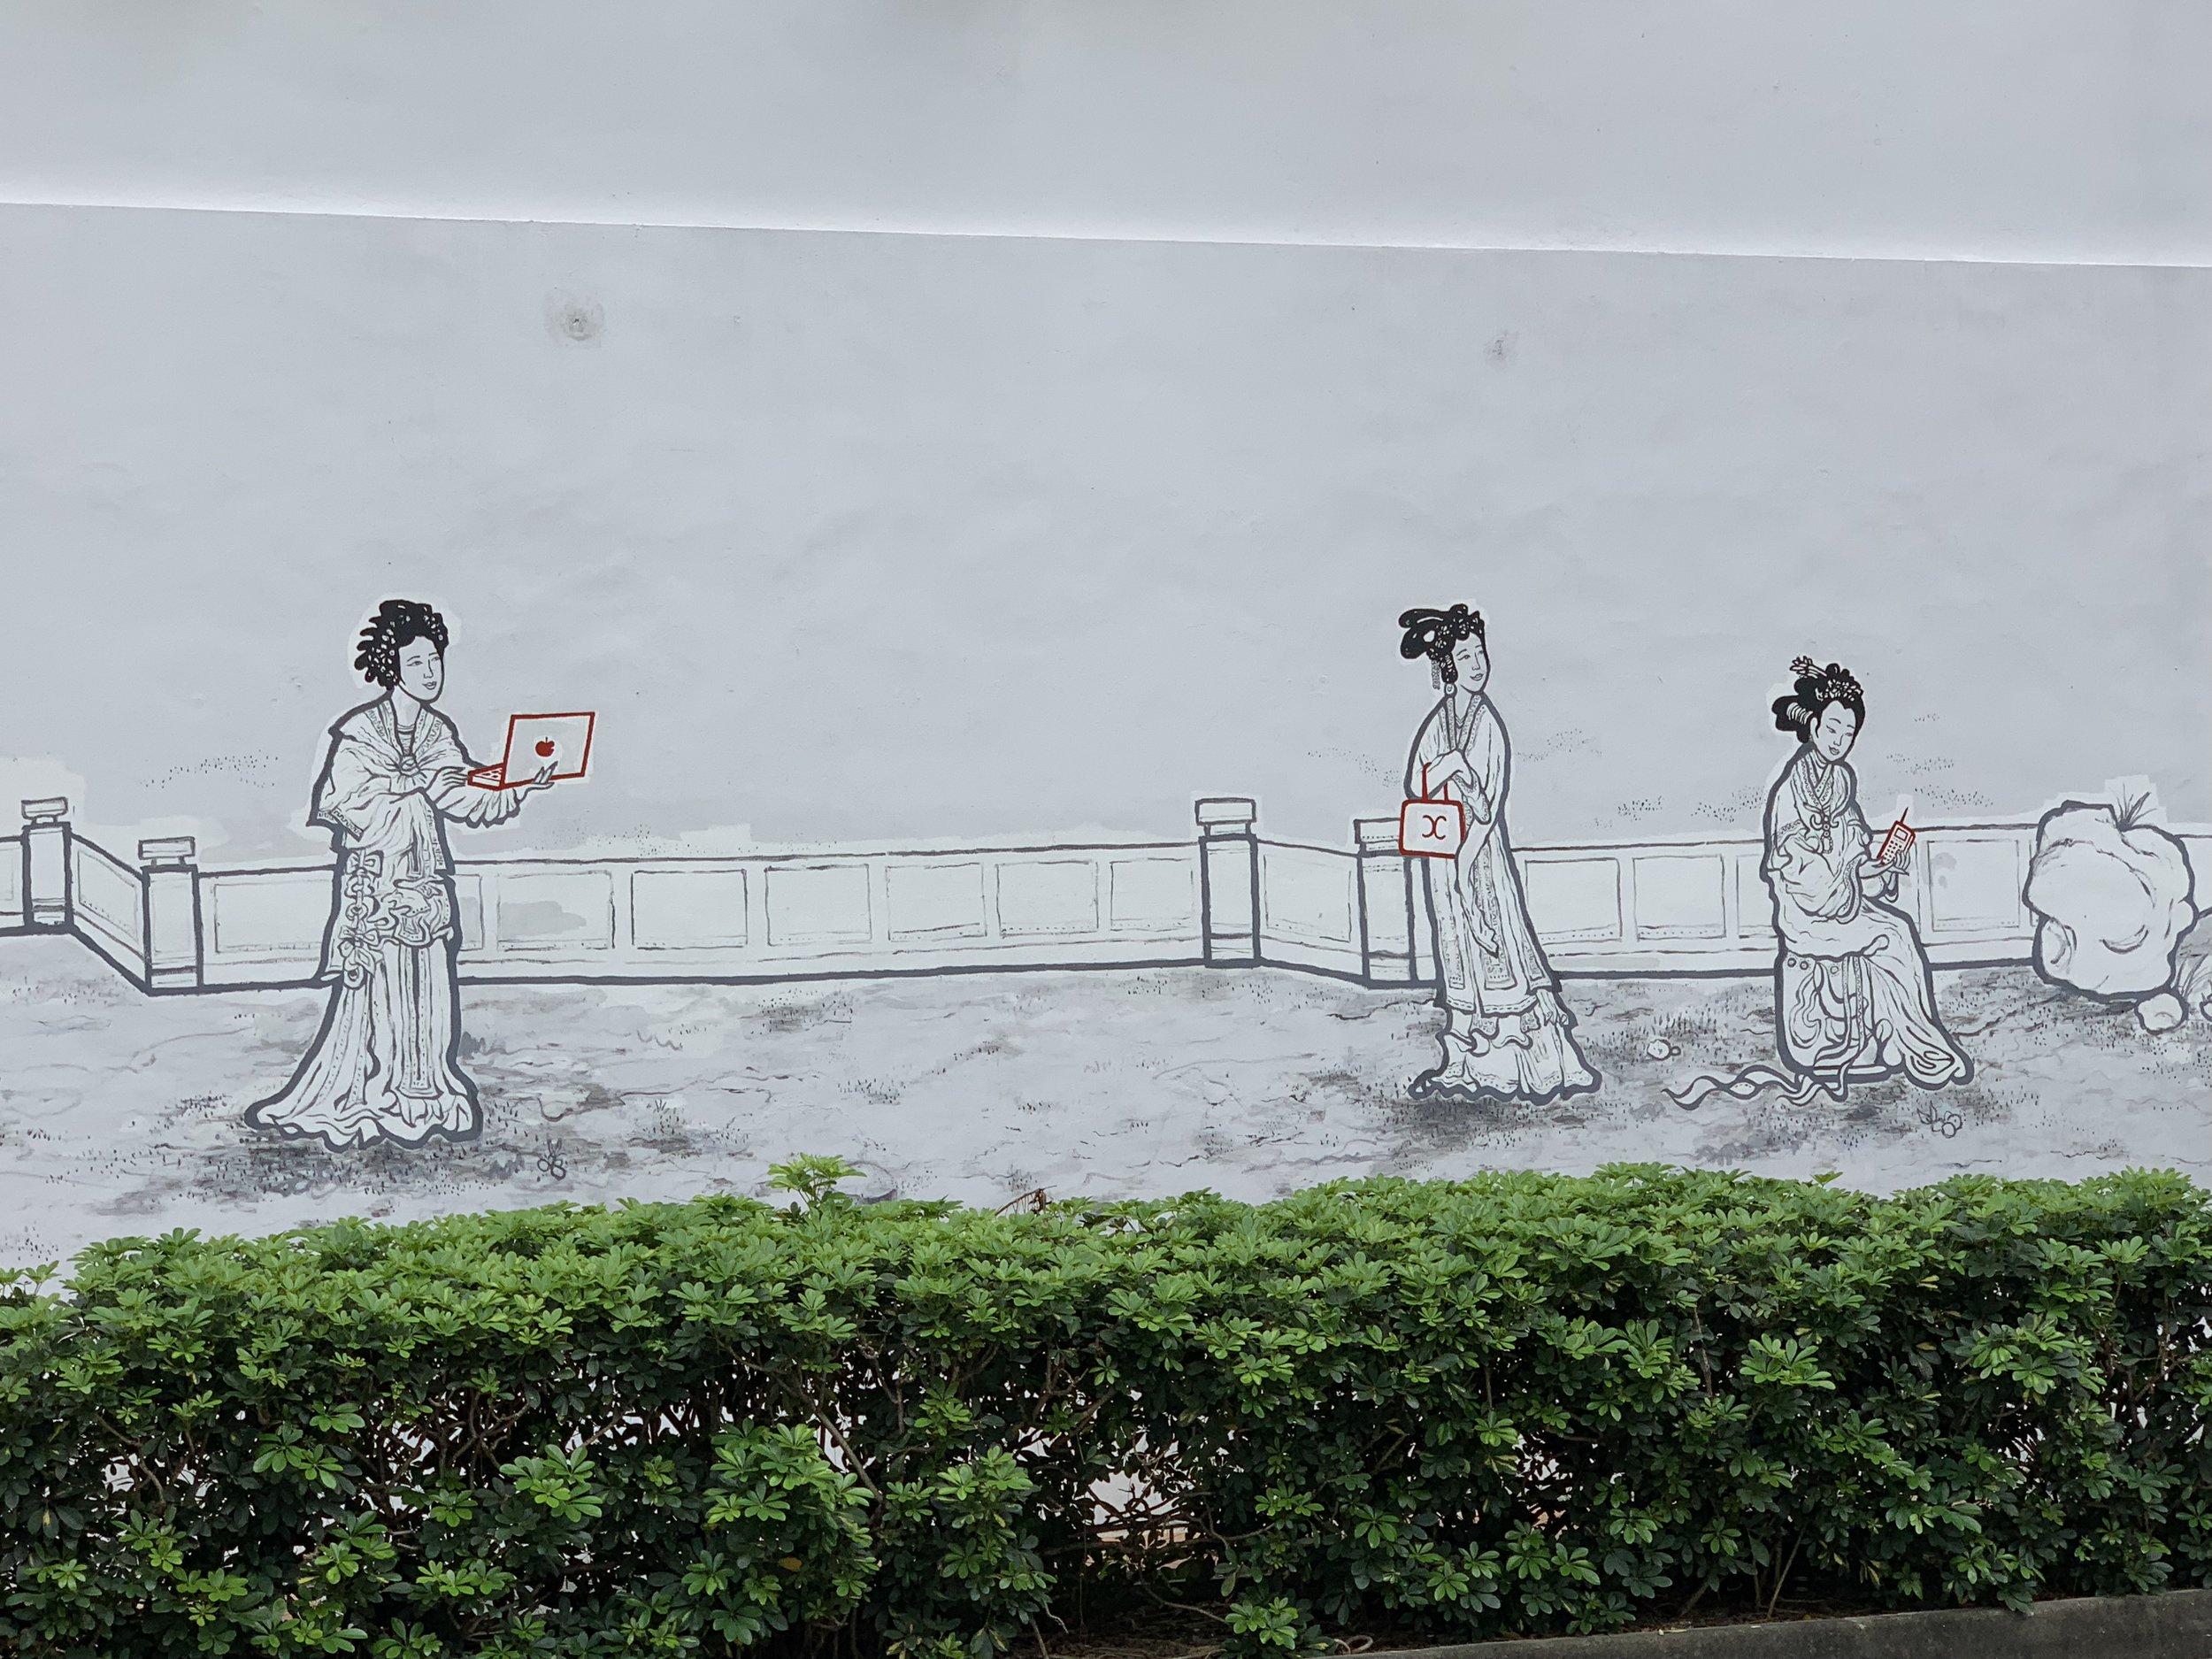 Singapore wears its ambivalence on its sleeve